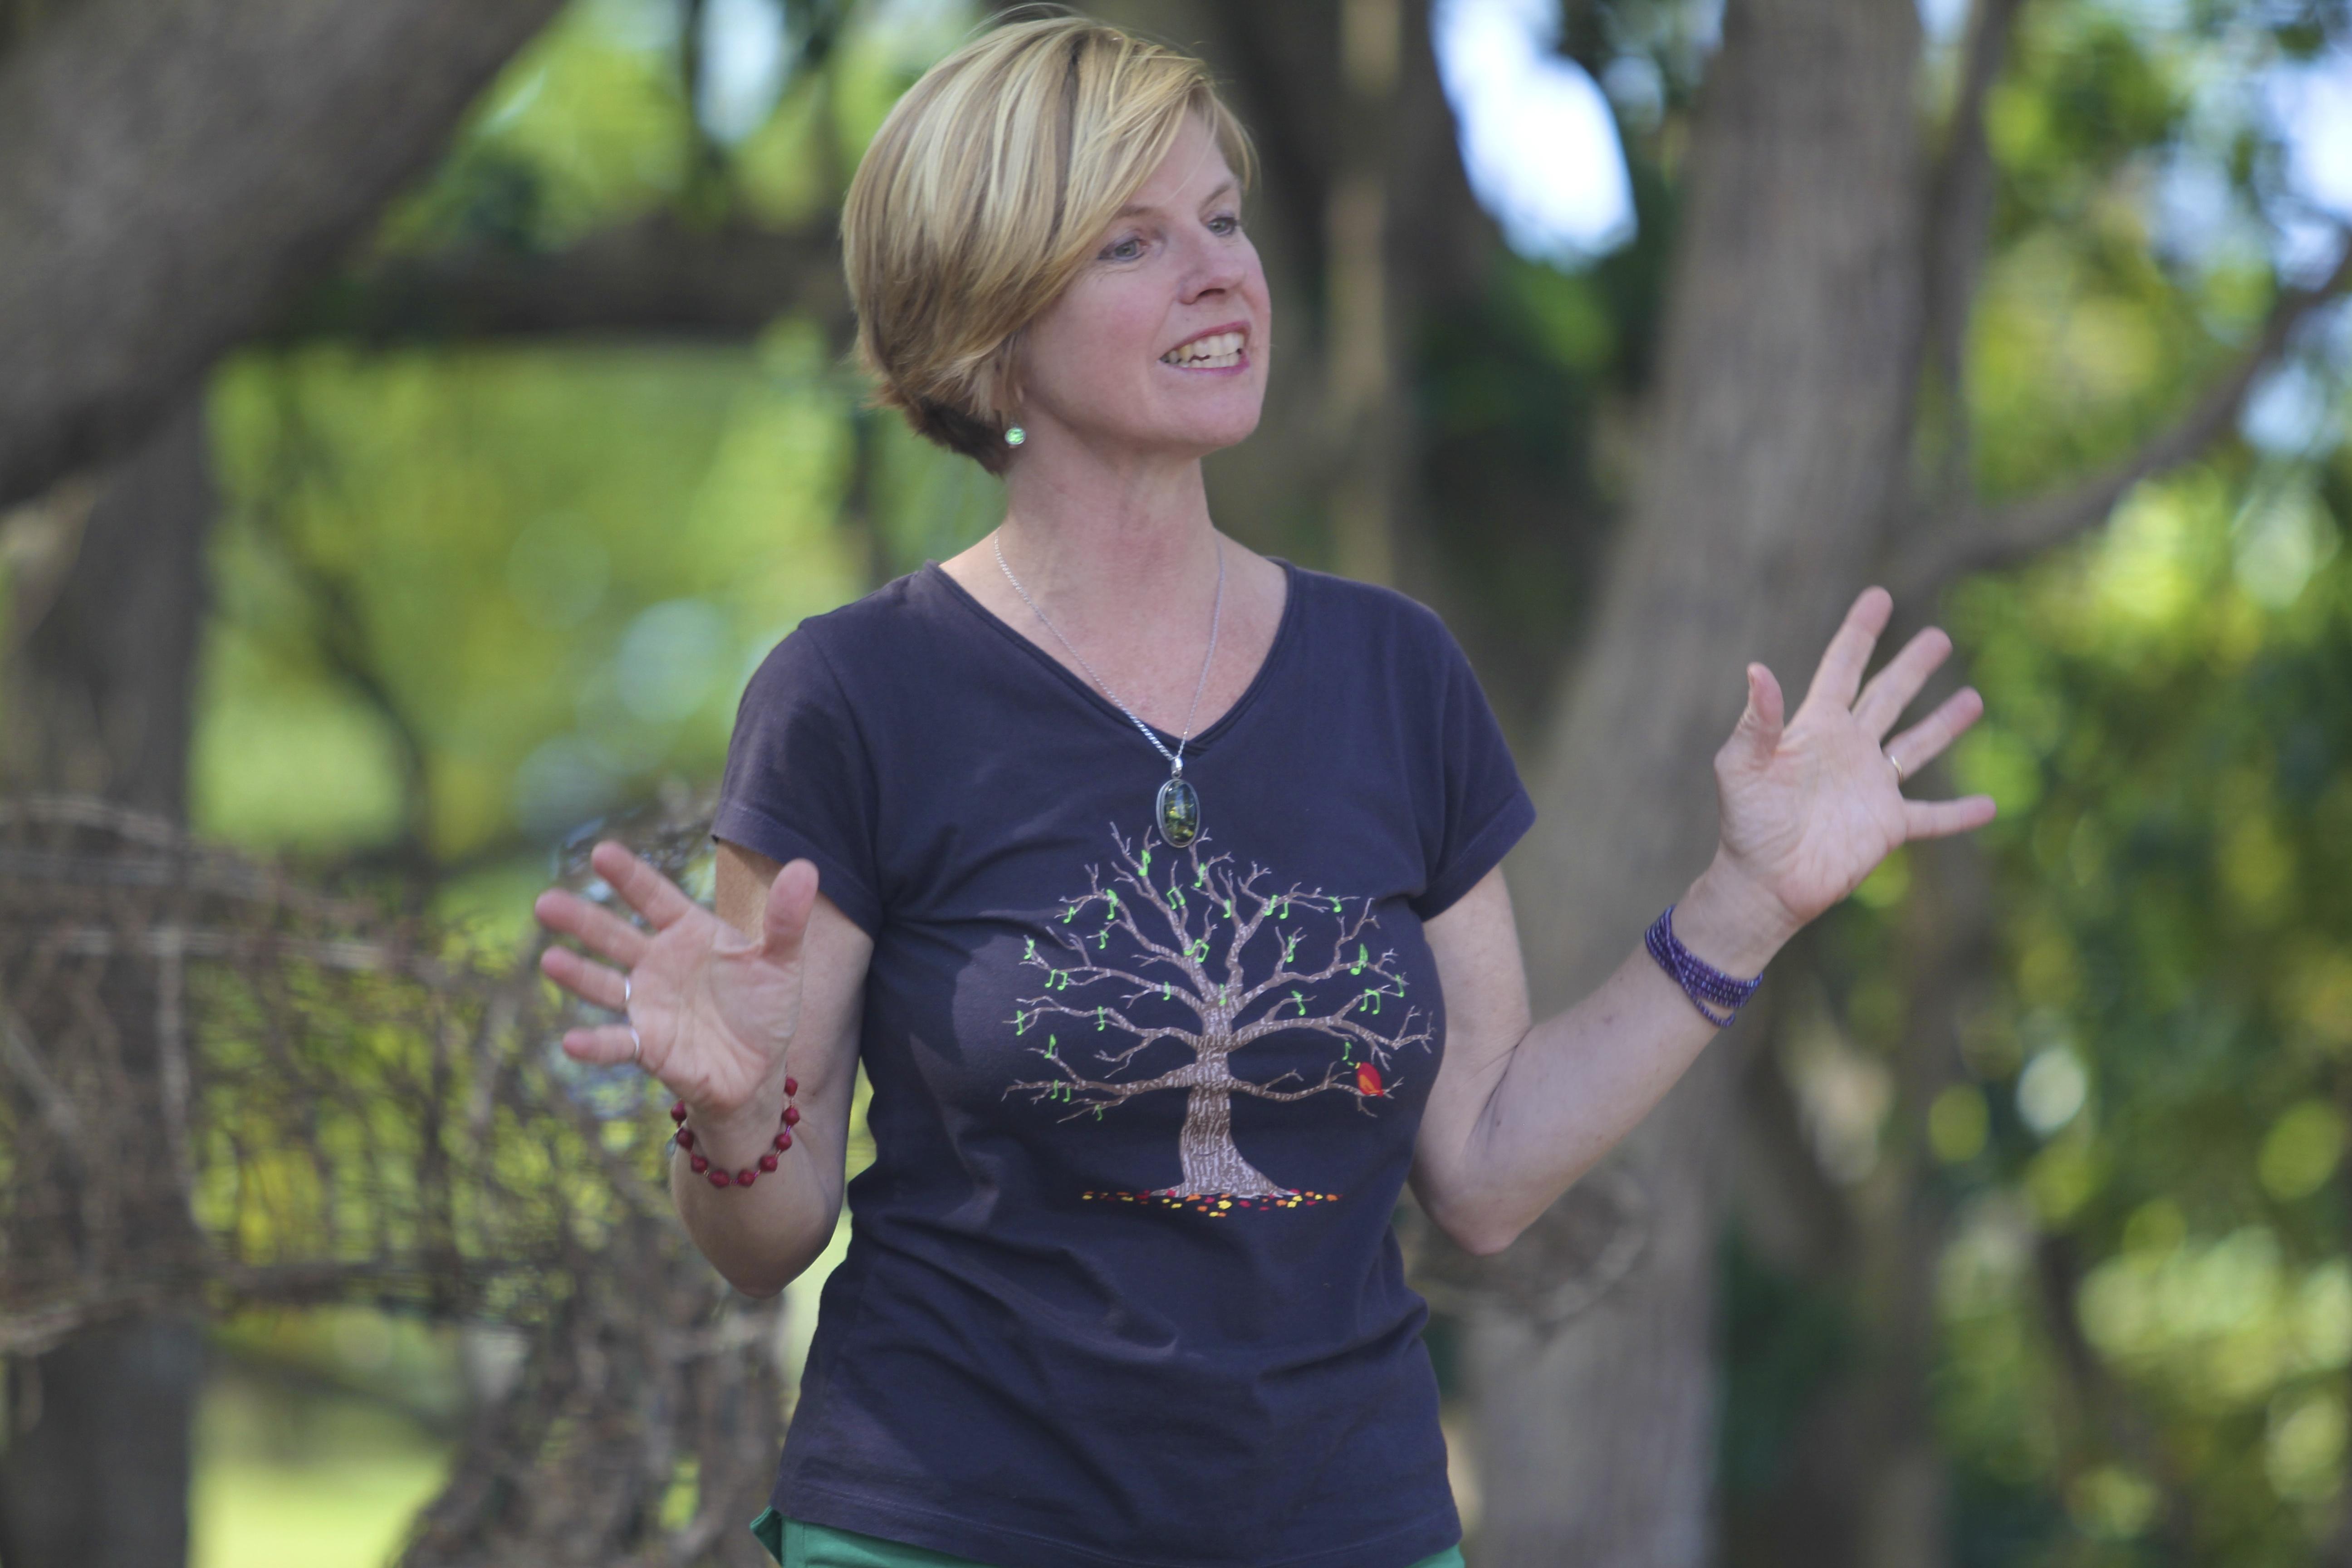 Jenni tells nature tales at the 'Living Earth Festival'.